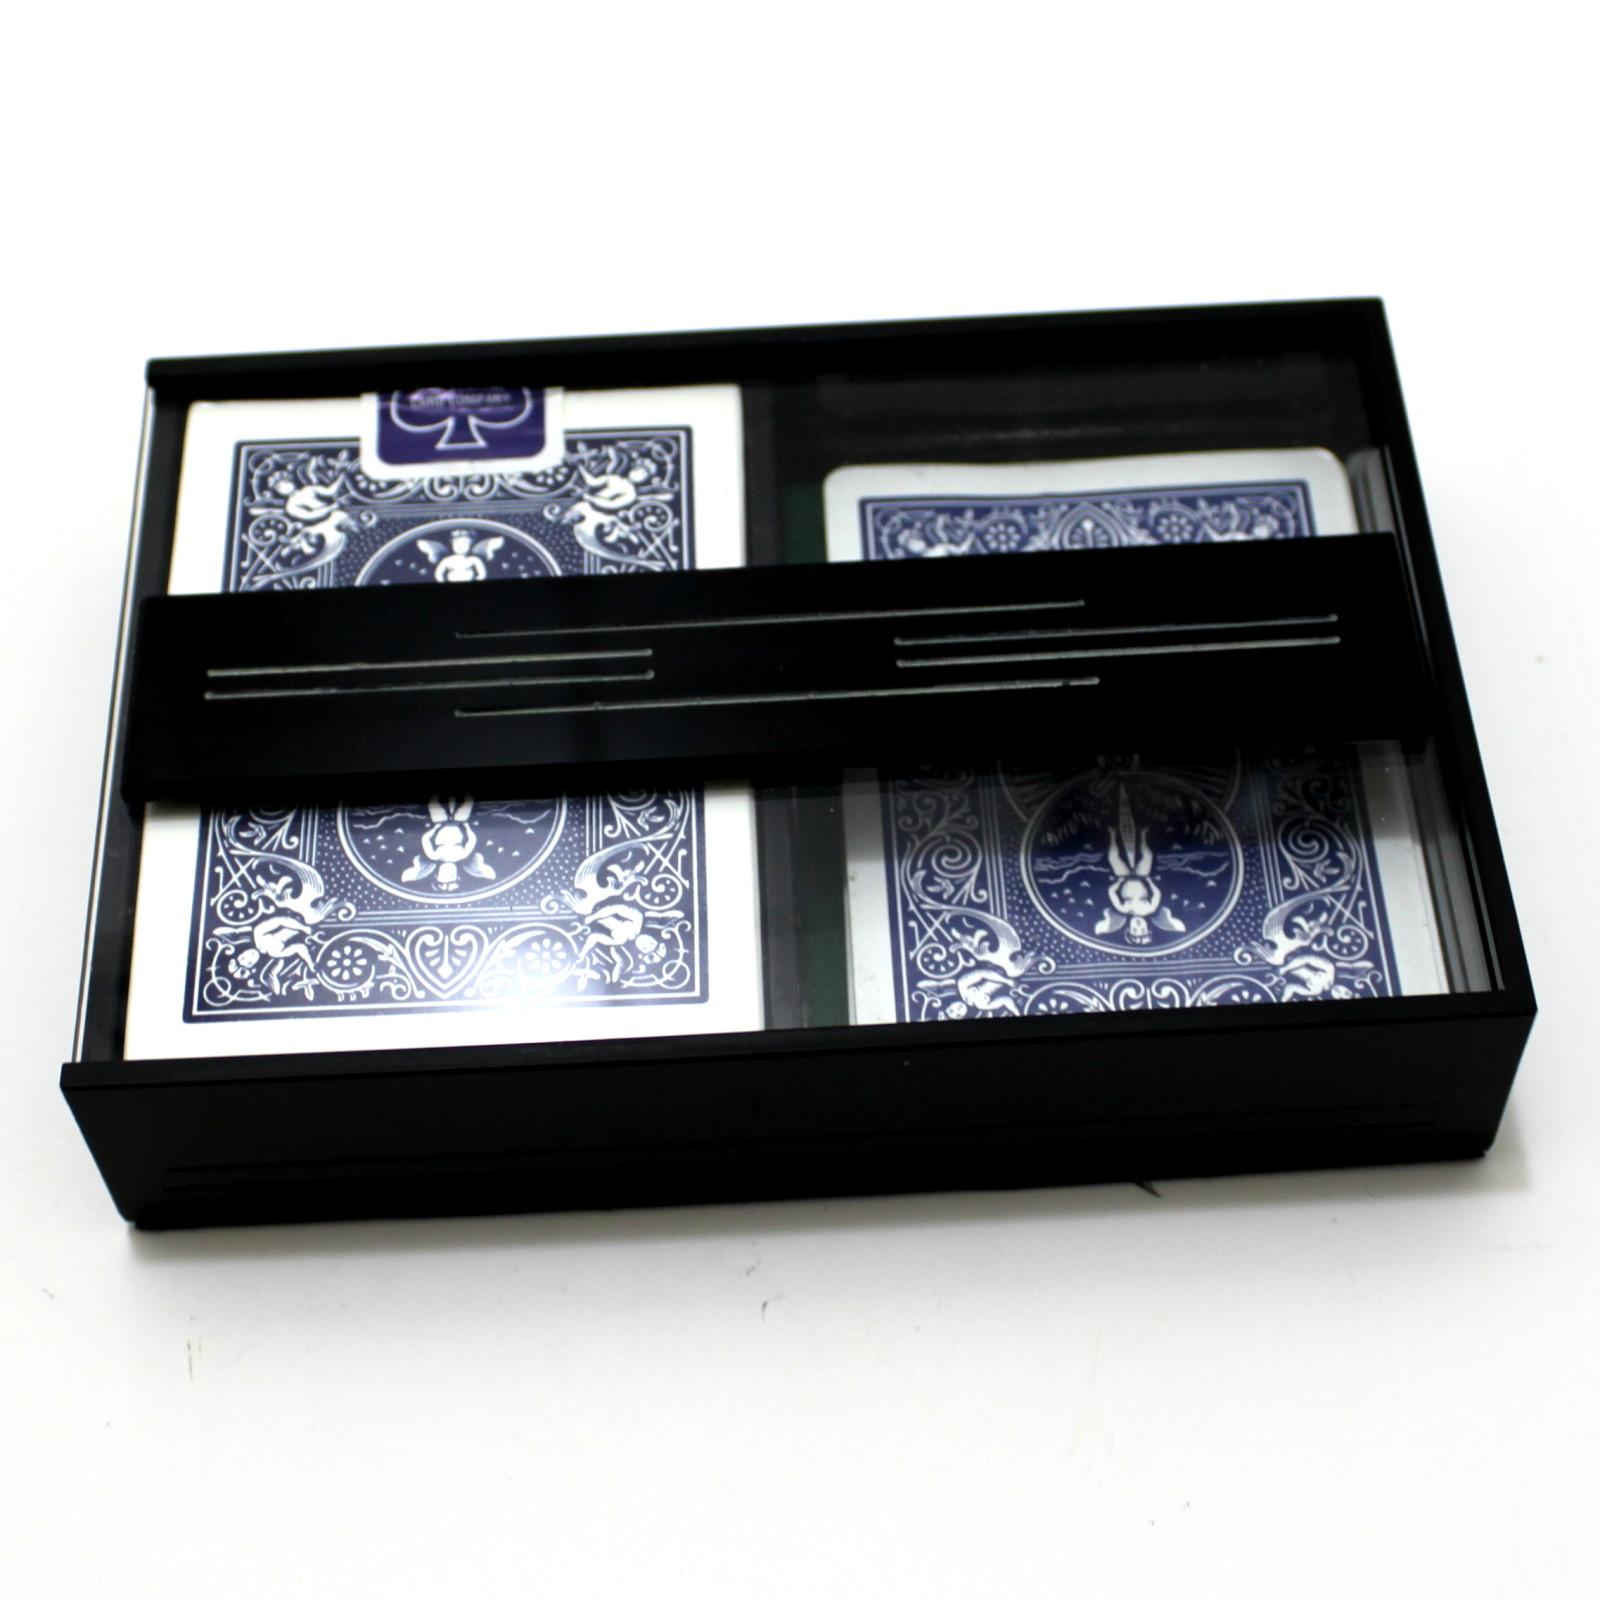 Electronic Surprise Box (Clear) by Anverdi